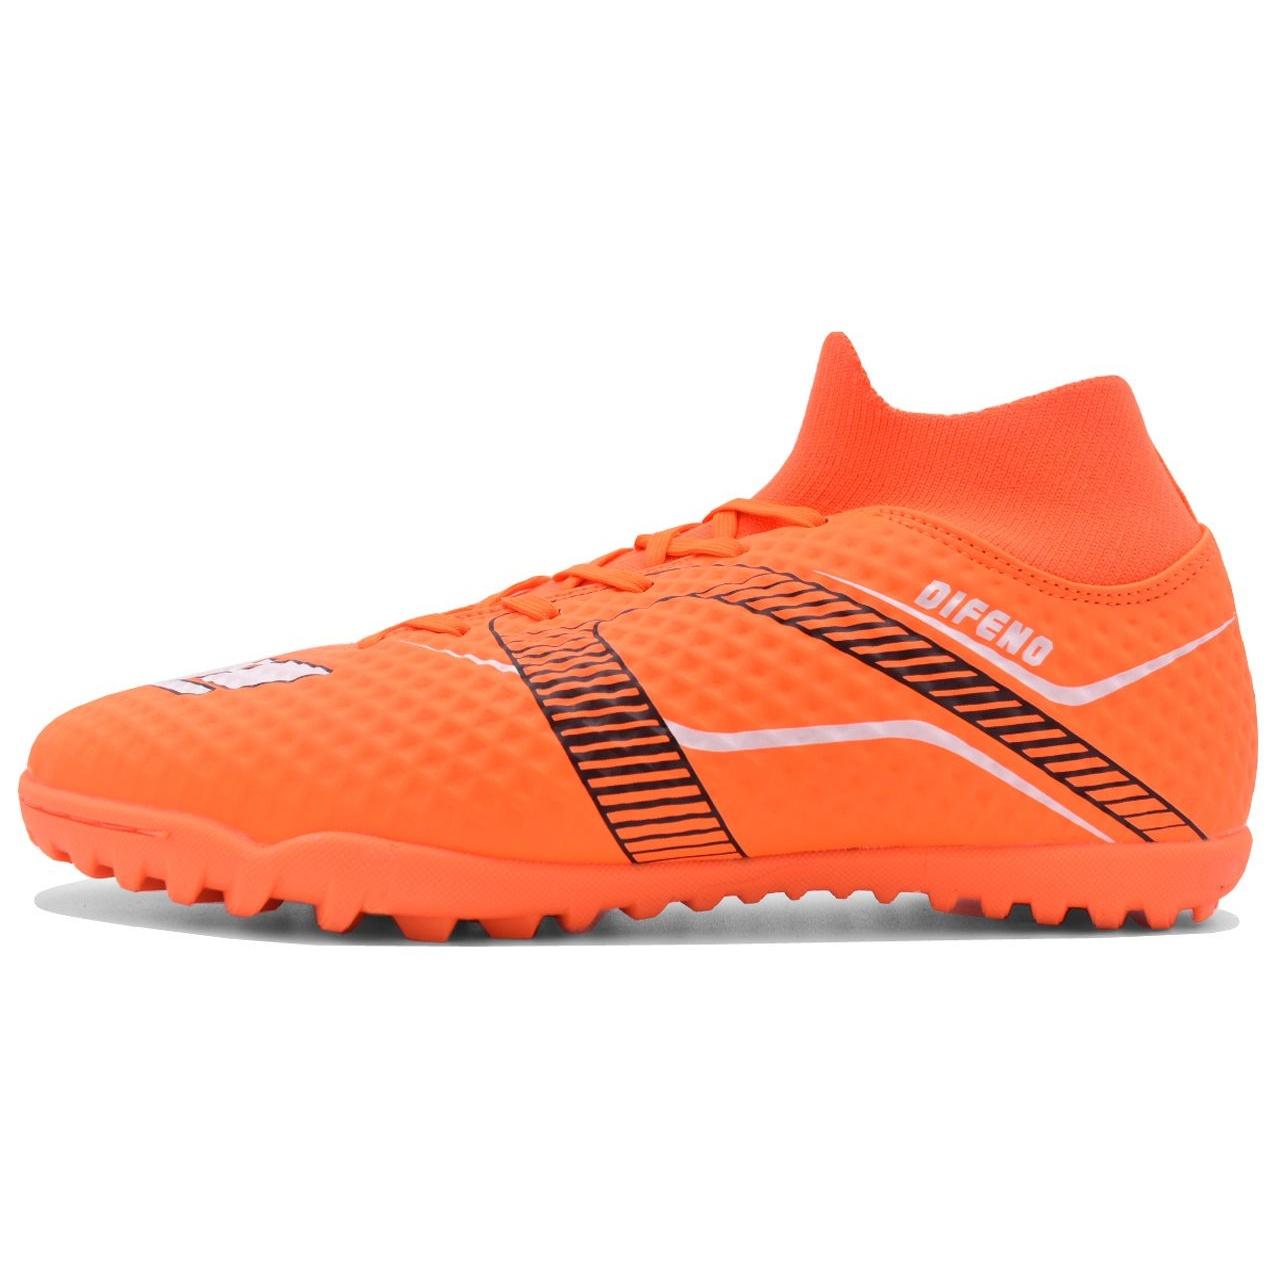 قیمت خرید کفش فوتبال مردانه دیفانو کد 1134 اورجینال